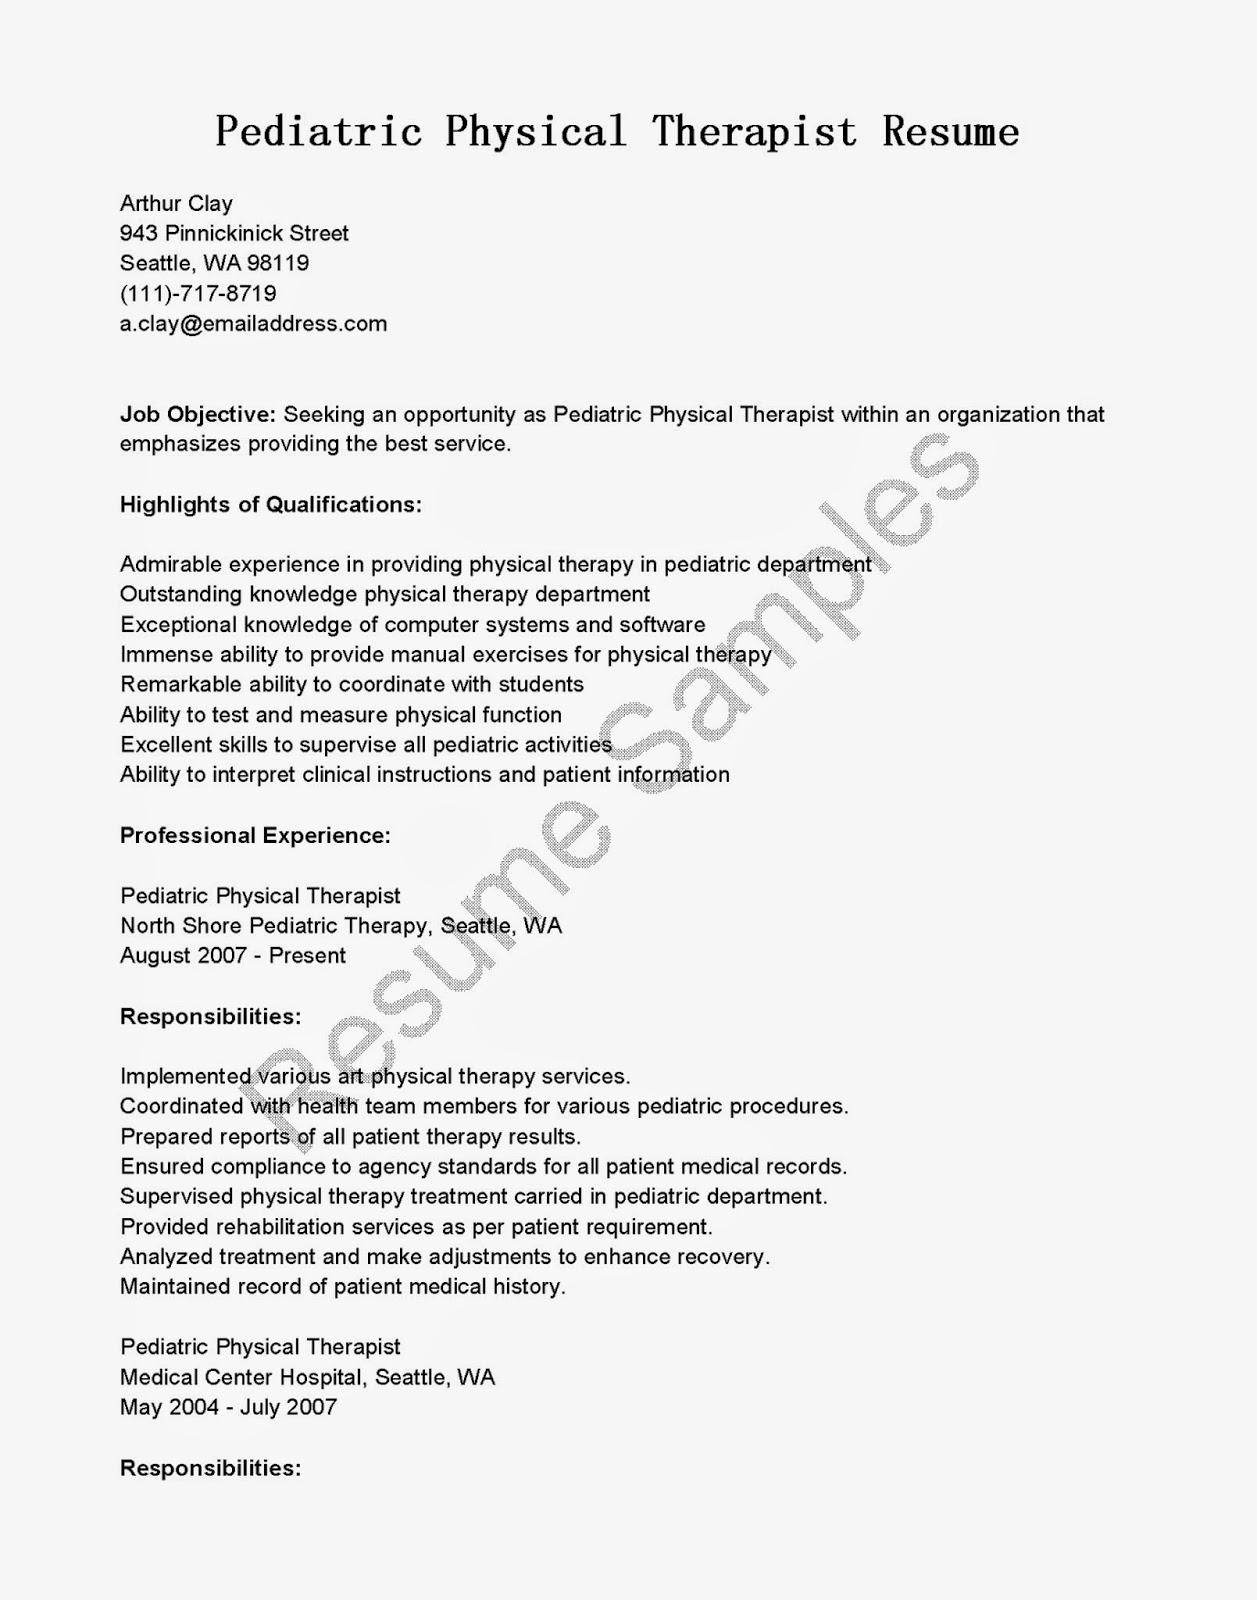 resume samples  pediatric physical therapist resume